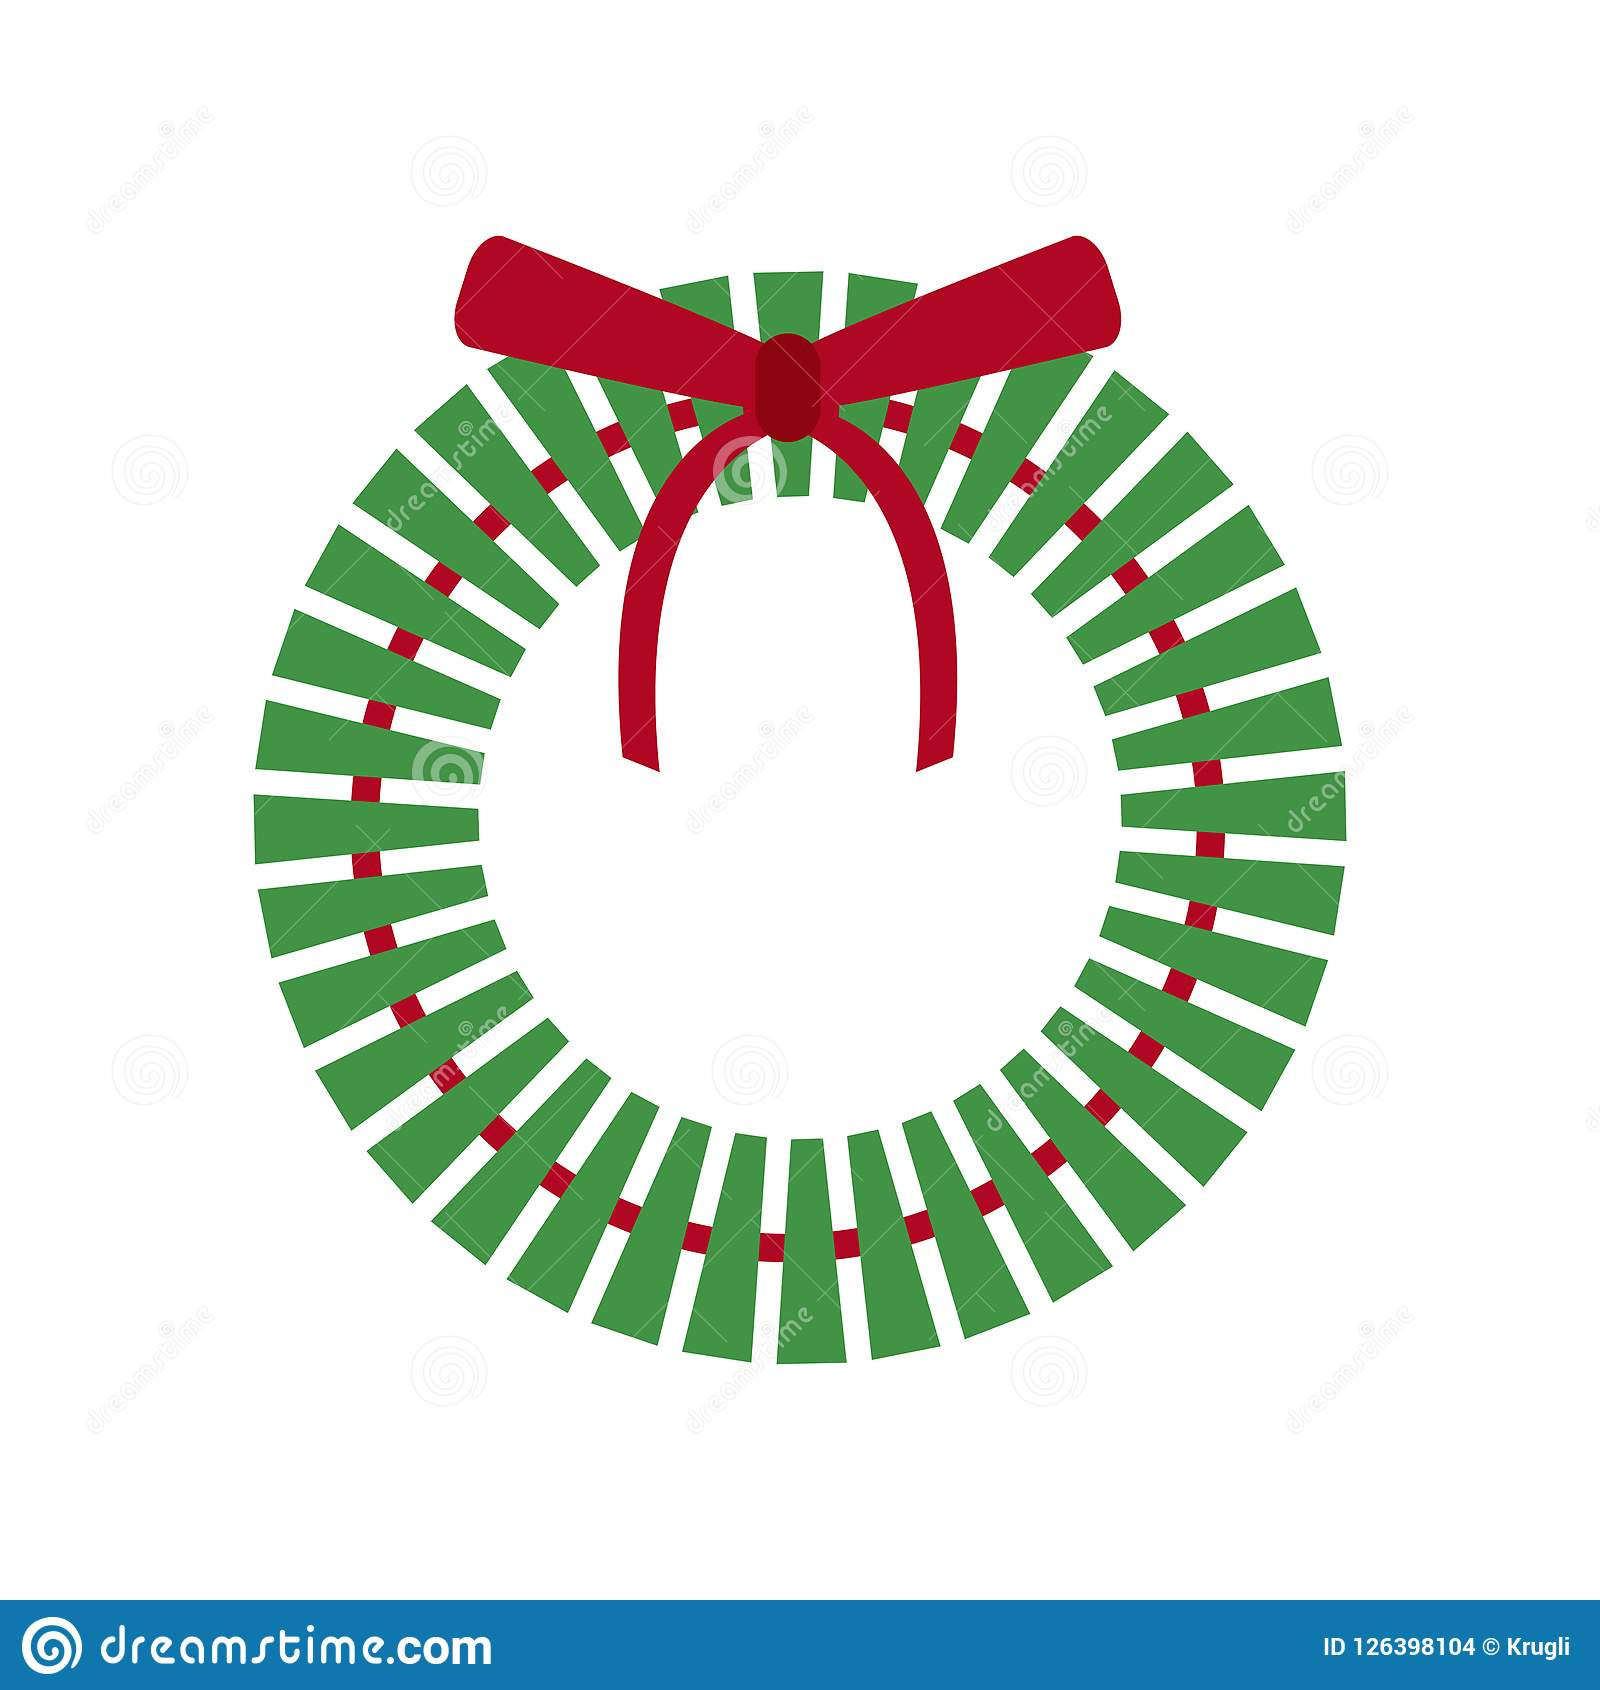 Christmas Holiday Wreath Icon Stock Vector Illustration Of Ornament Festive 126398104